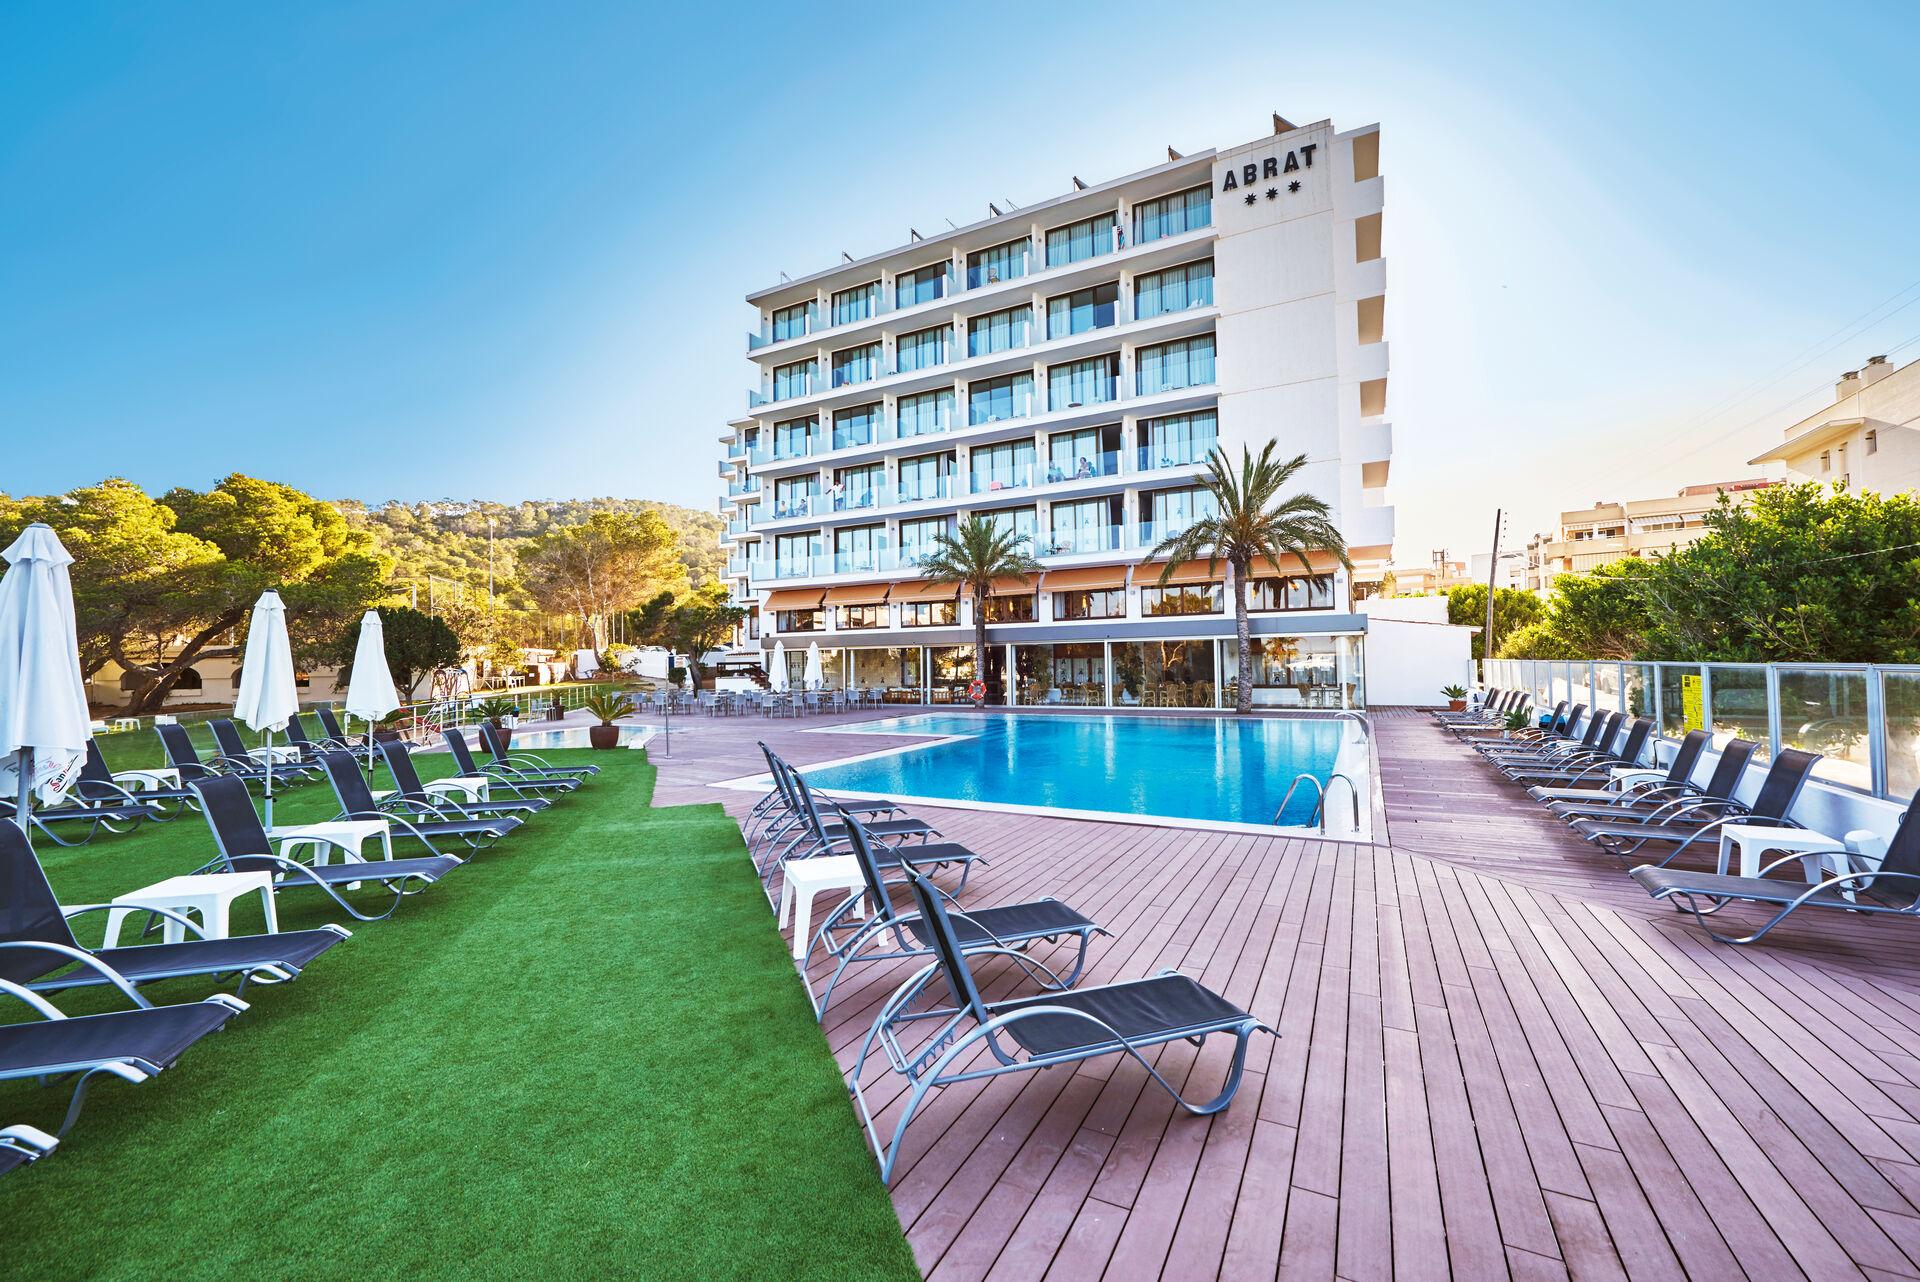 Hotel Abrat 3* - 1